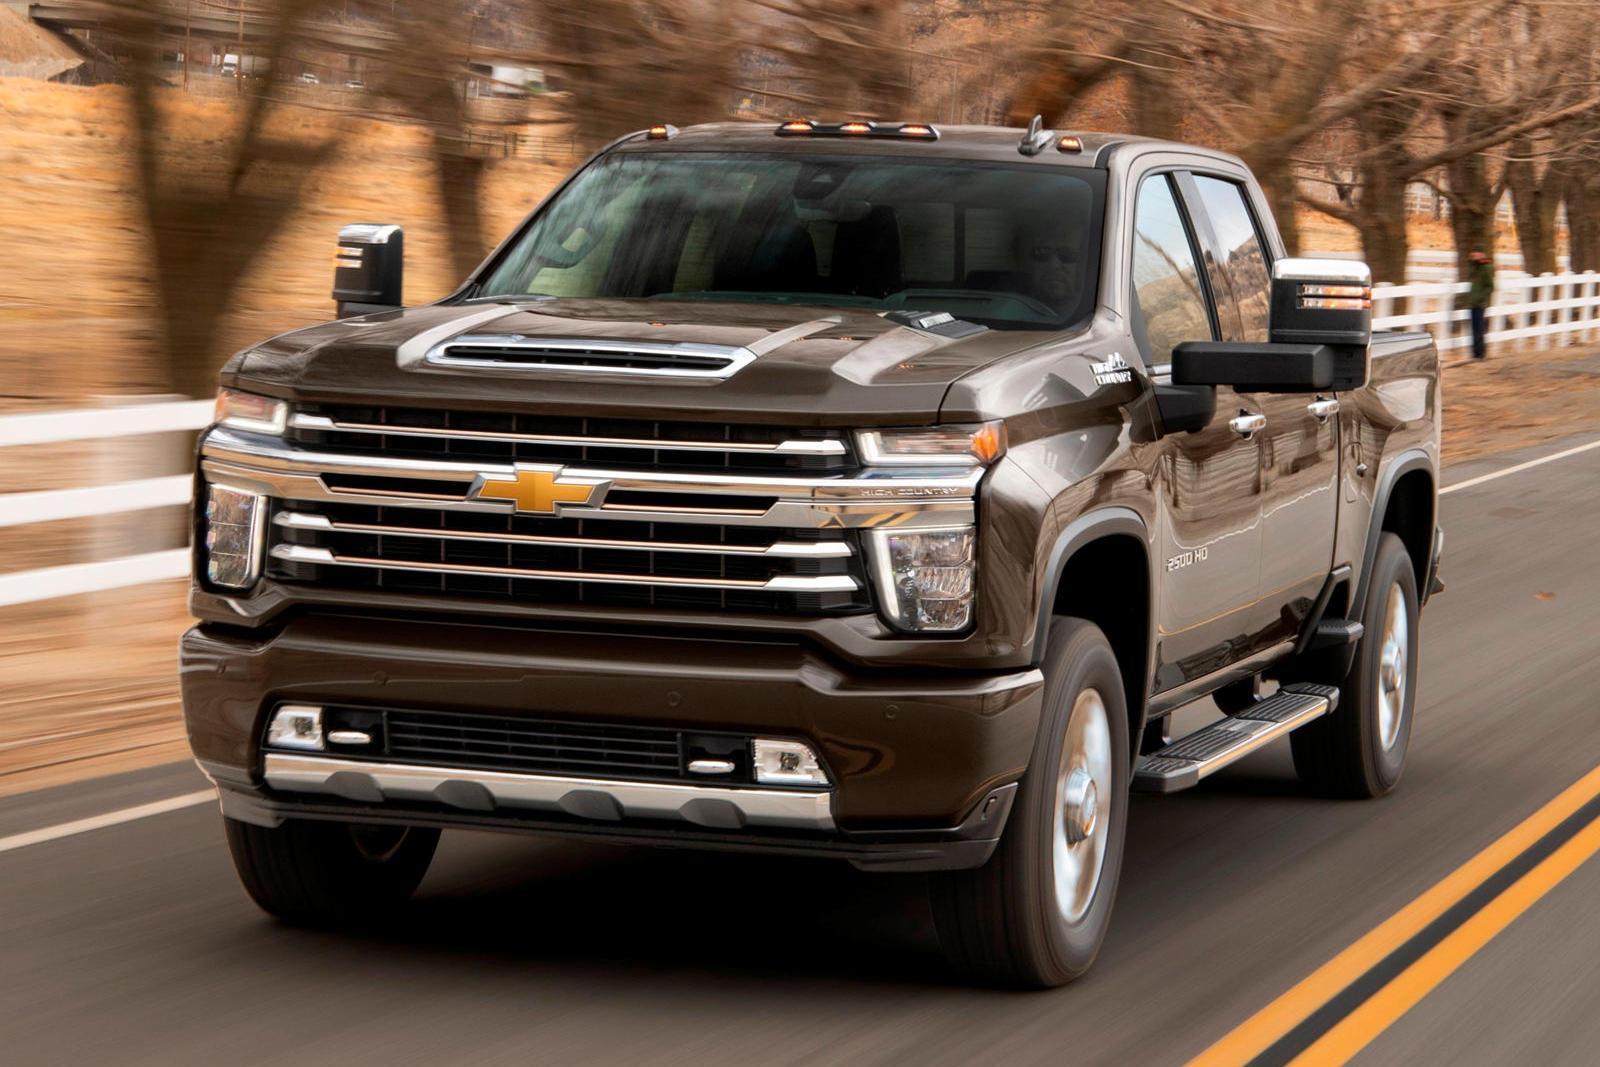 2020 Chevrolet Silverado HD Is Cheaper Than Last Year's ...